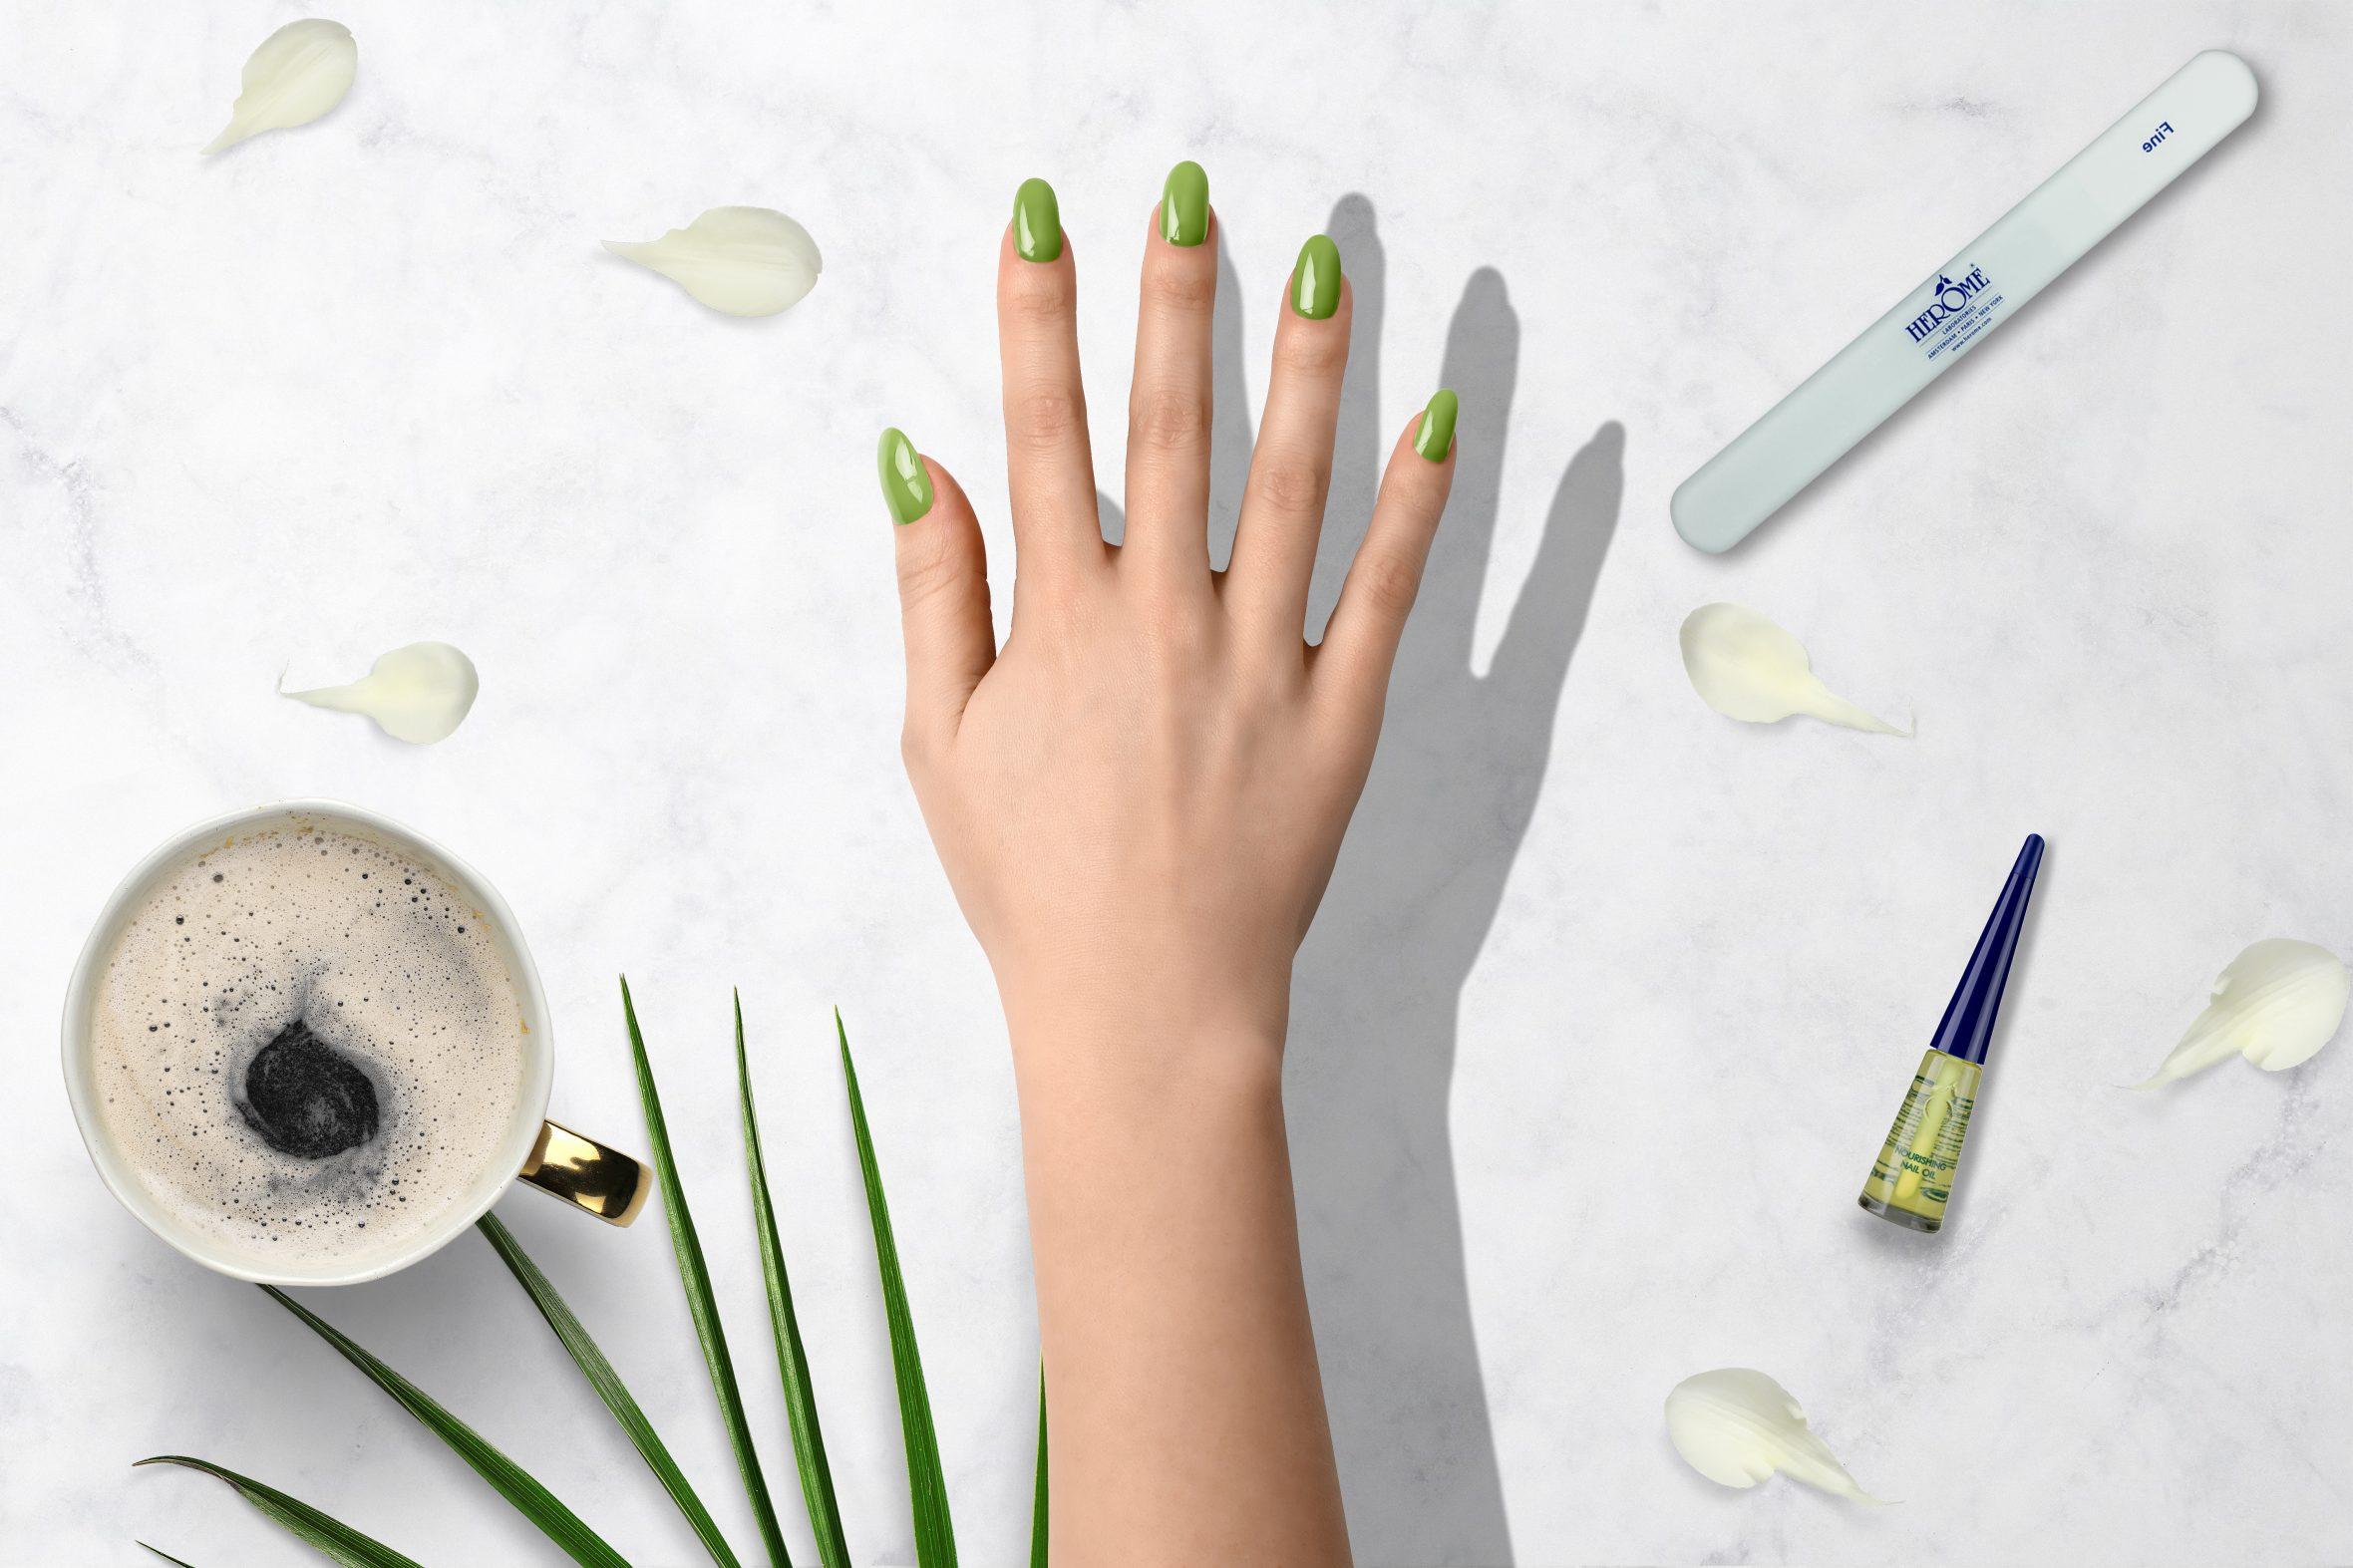 groene nagellak kleurnummer 171 uit de Herôme nagellak kleuren